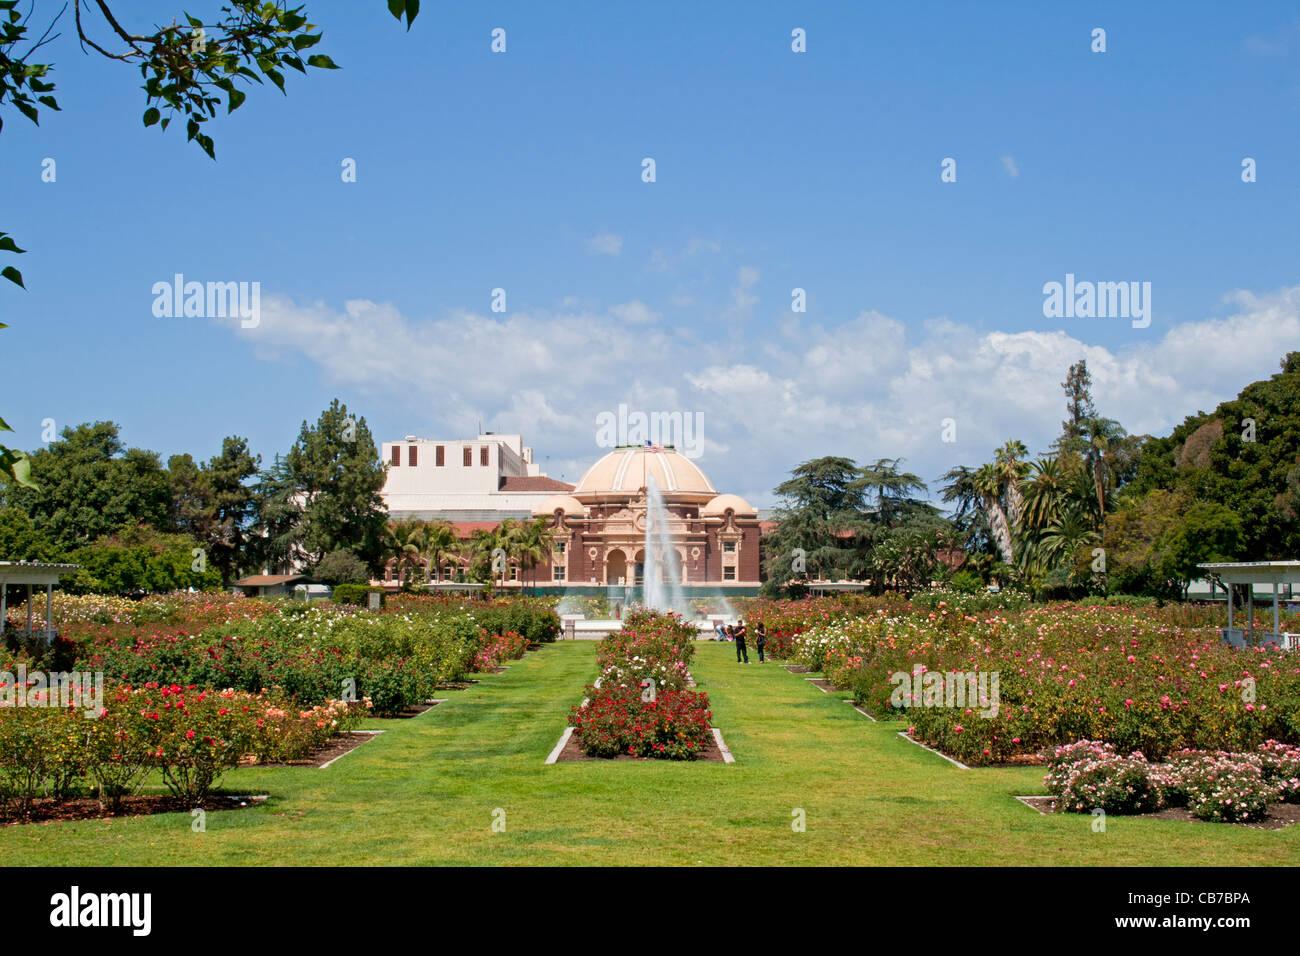 Rose Garden, Exposition Park, Los Angeles, California (LA) - Stock Image